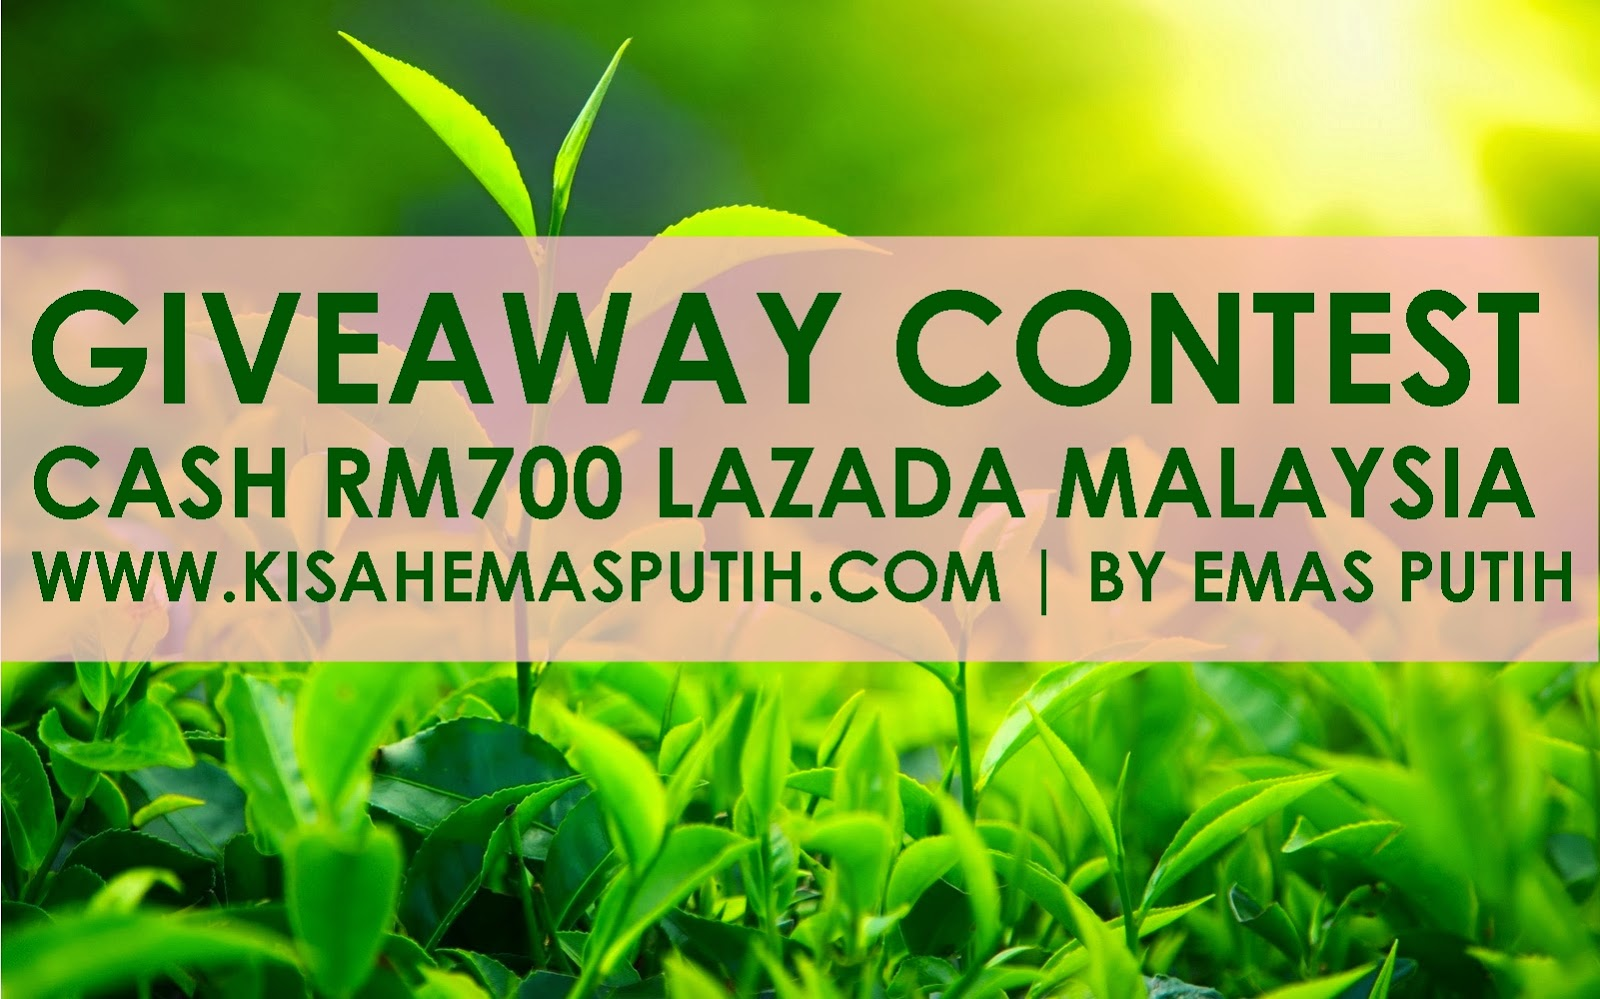 http://www.kisahemasputih.com/2014/10/giveaway-contest-rm700-jualan-hebat.html